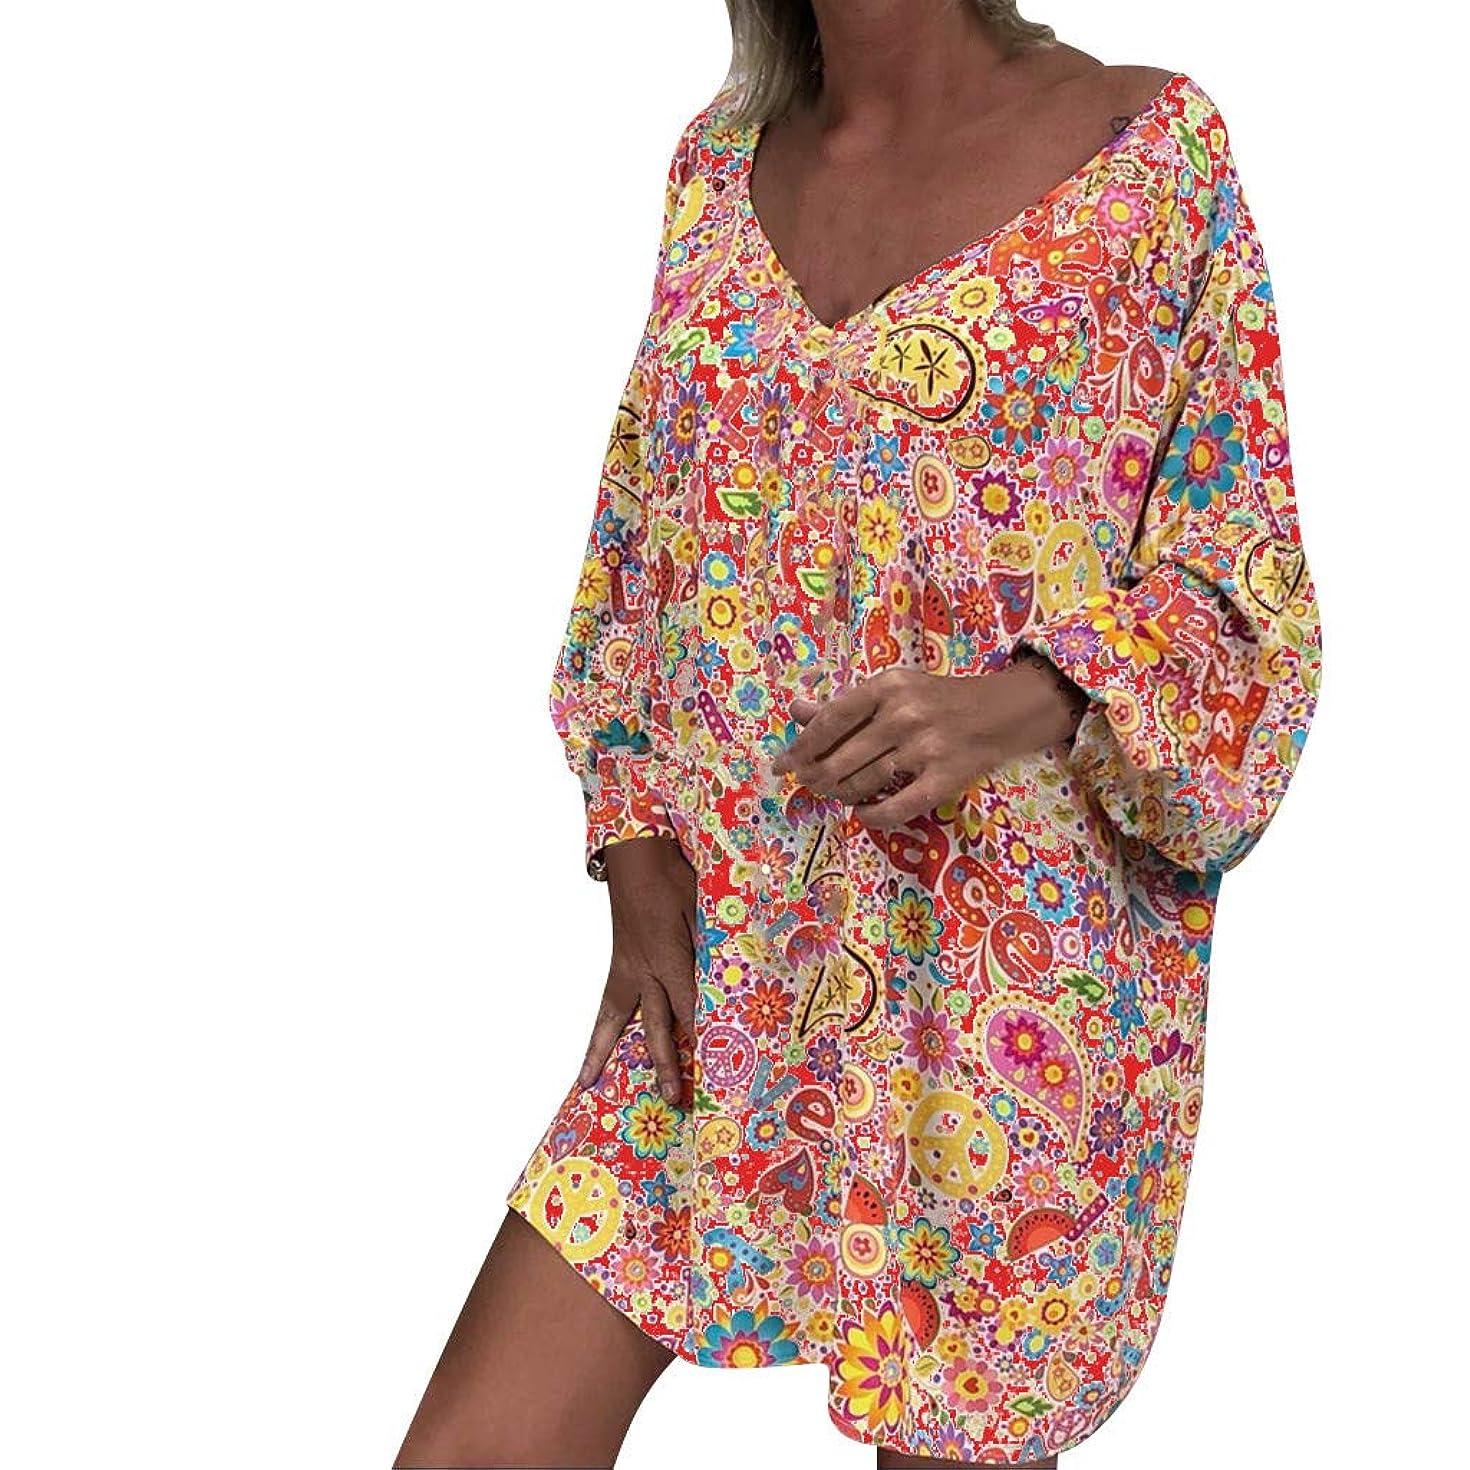 Plus Size Women's Casual Long Sleeve Deep V Neck Floral Printed Irregular Loose Dress AmyDong